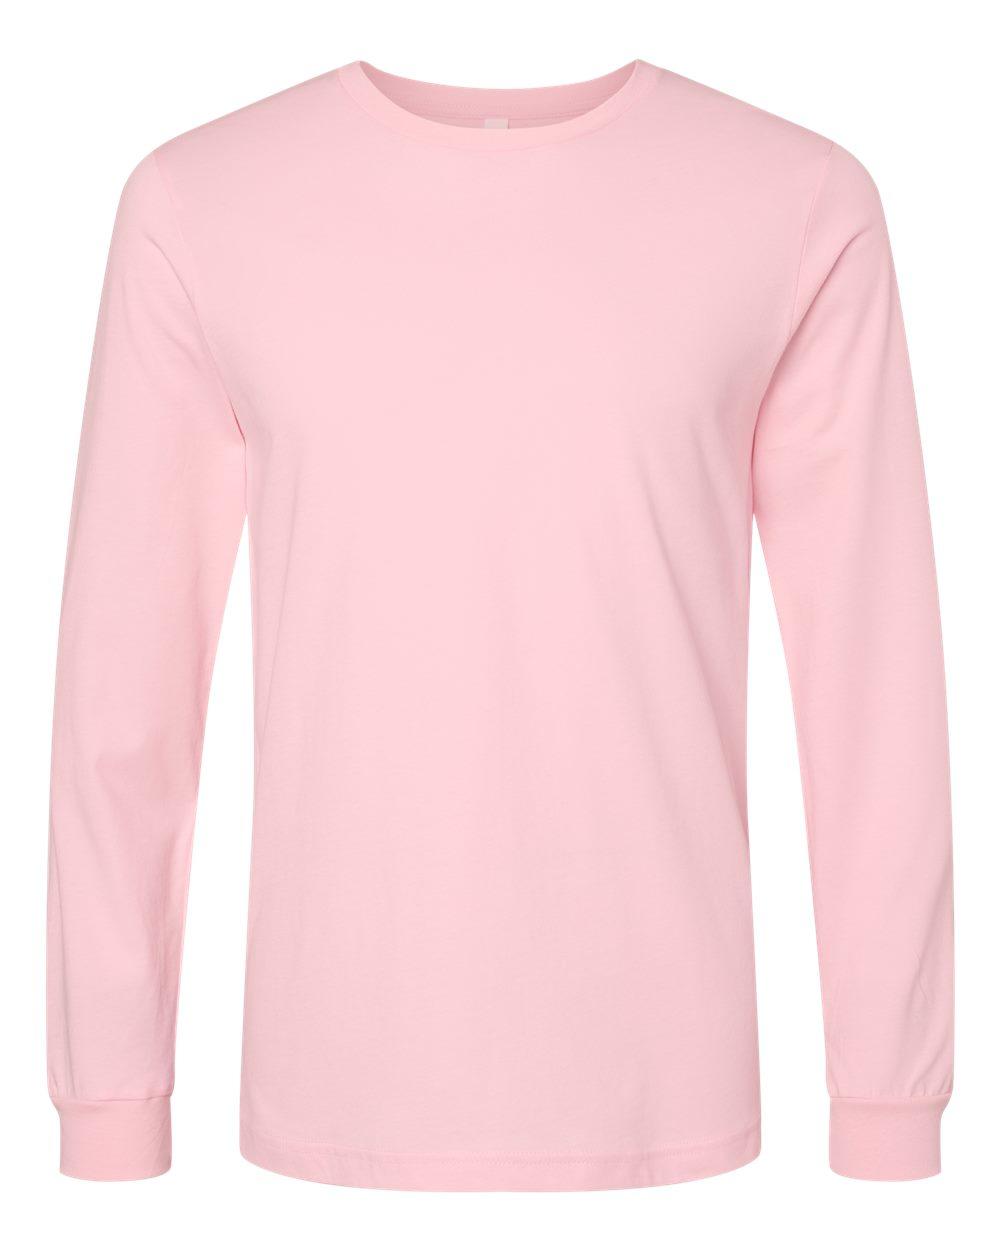 Bella-Canvas-Mens-Blank-Top-Long-Sleeve-Jersey-Tee-T-Shirt-3501-up-to-3XL thumbnail 49